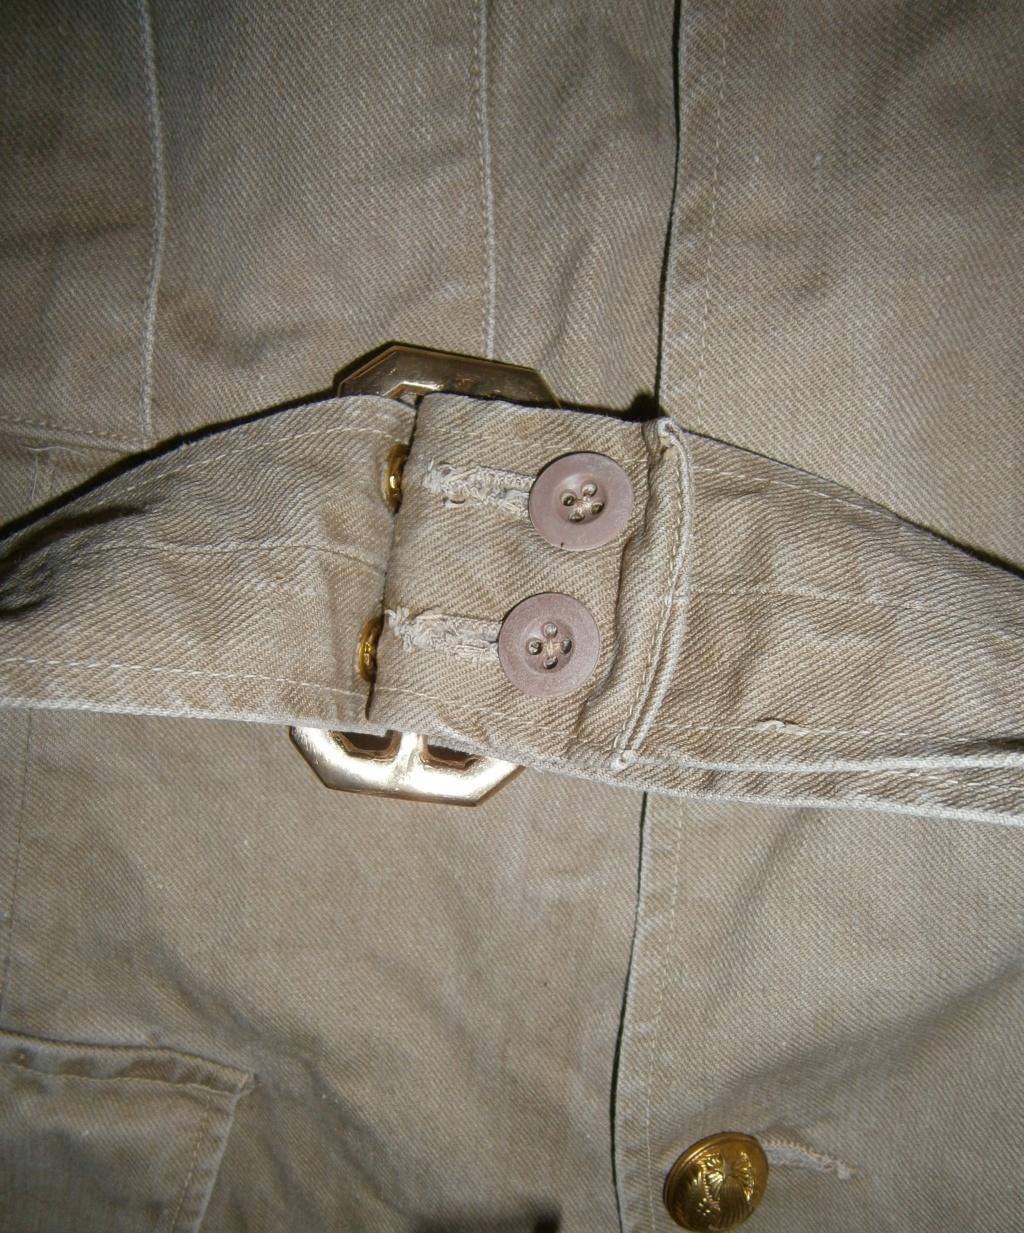 identification veste française type saharienne Pb090015